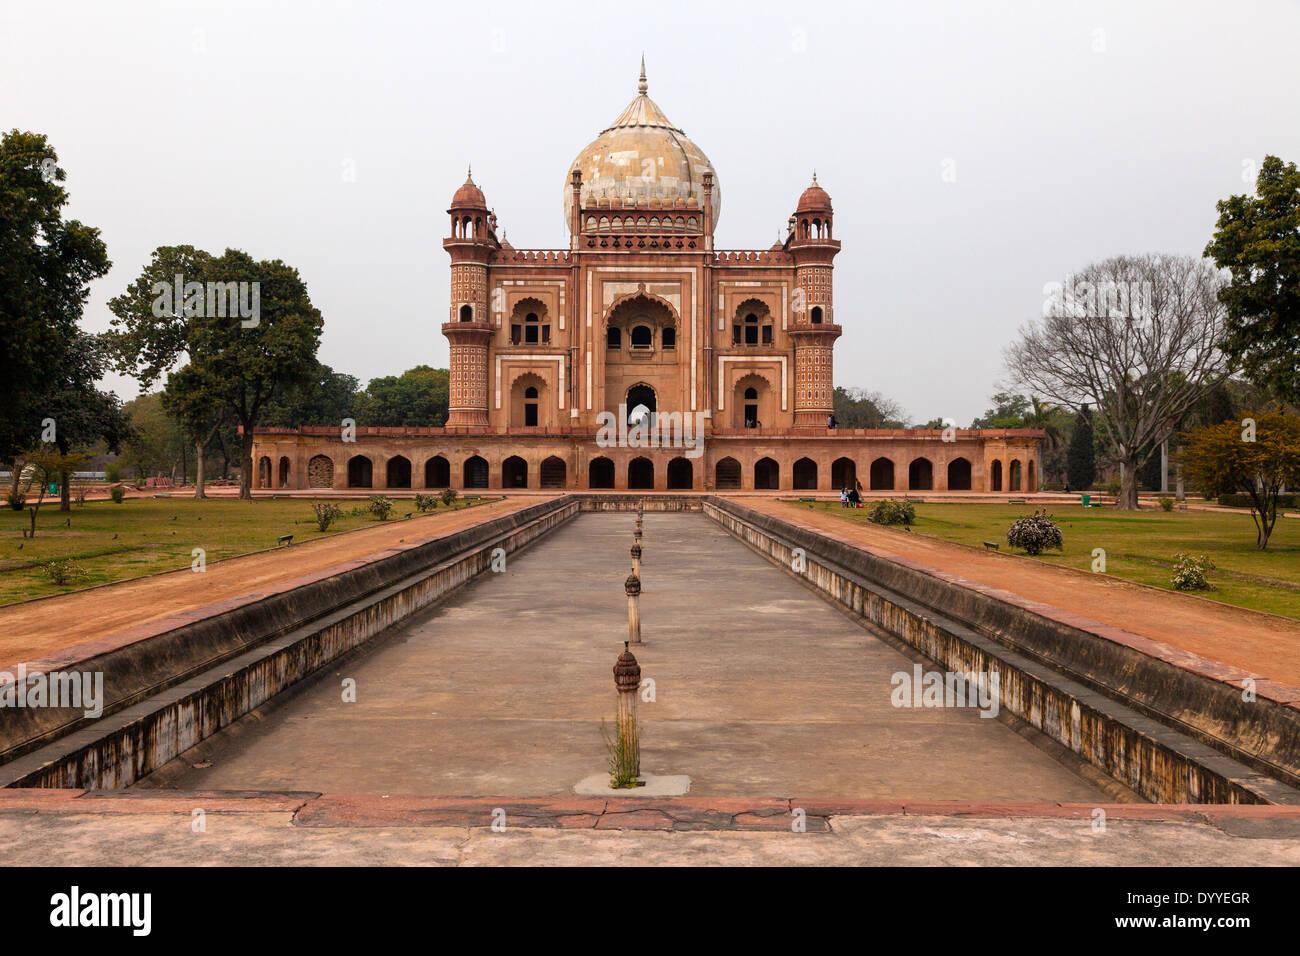 New Delhi, India. Safdarjang della tomba costruita 1753-54. Immagini Stock